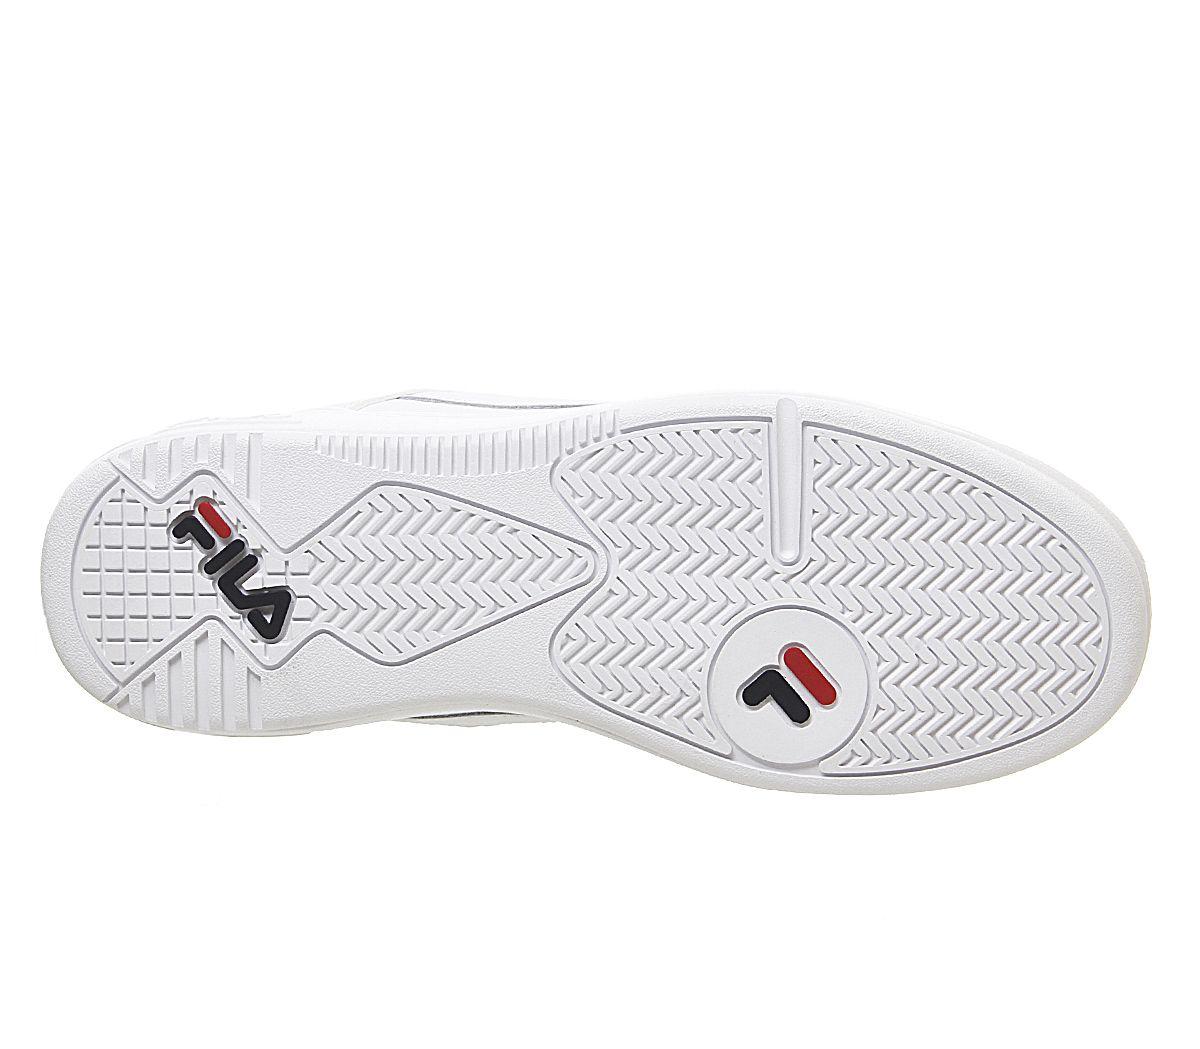 Debardeur-FILA-Wx-100-Trainers-White-FILA-Marine-Fila-Rouge-Baskets miniature 5